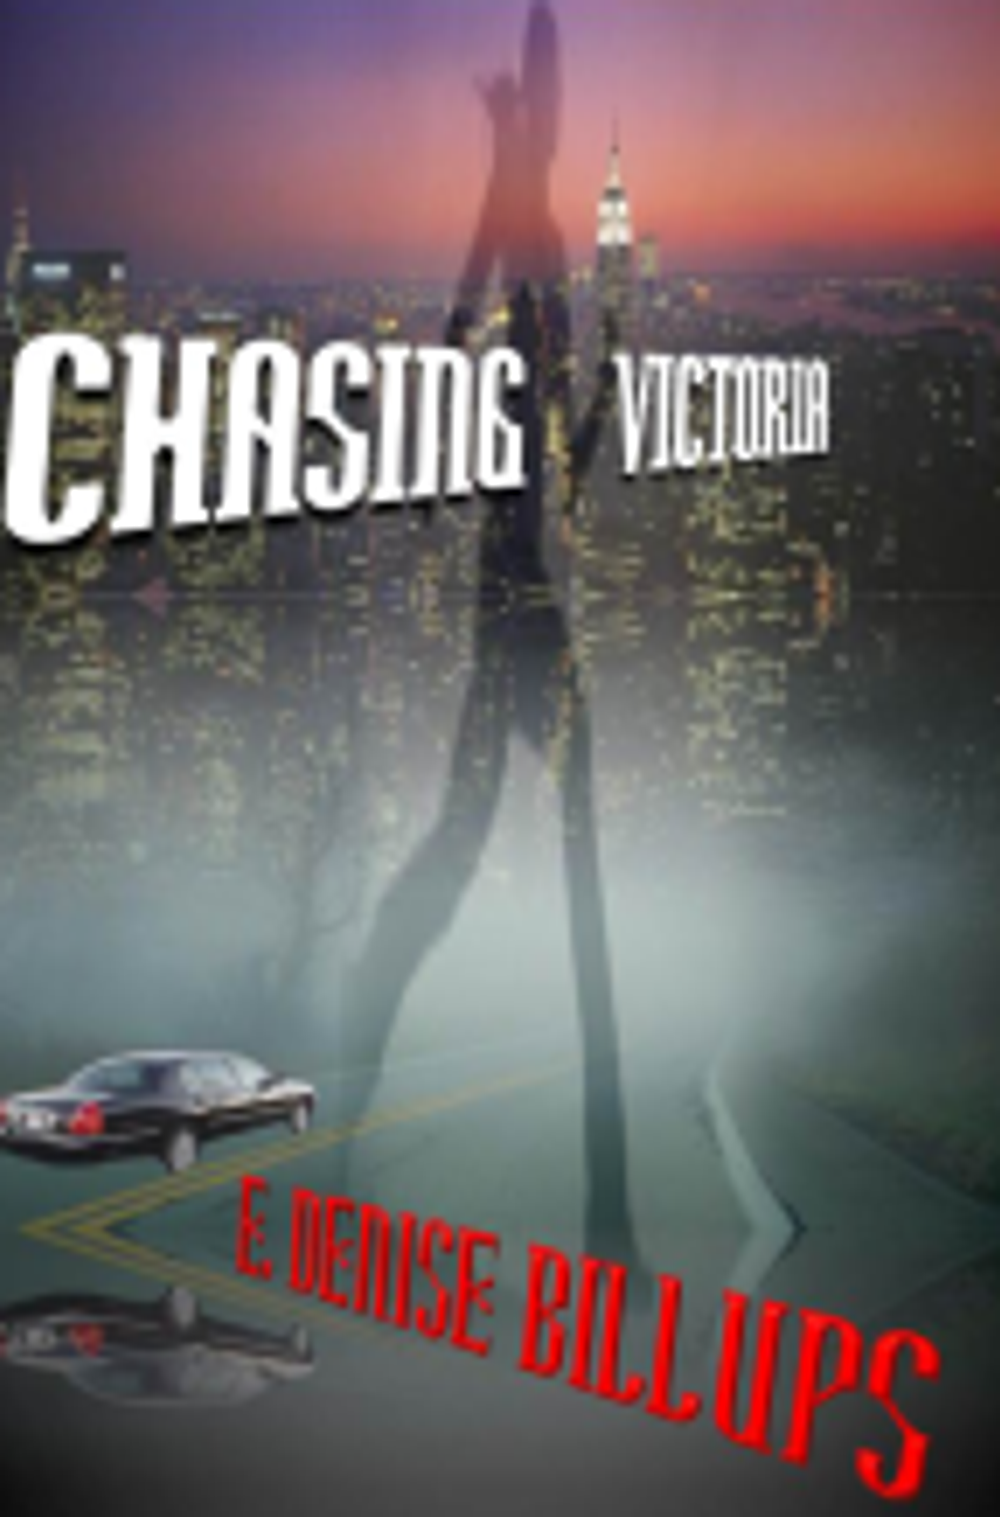 Book 2 -Chasing Victoria 6-30-2015